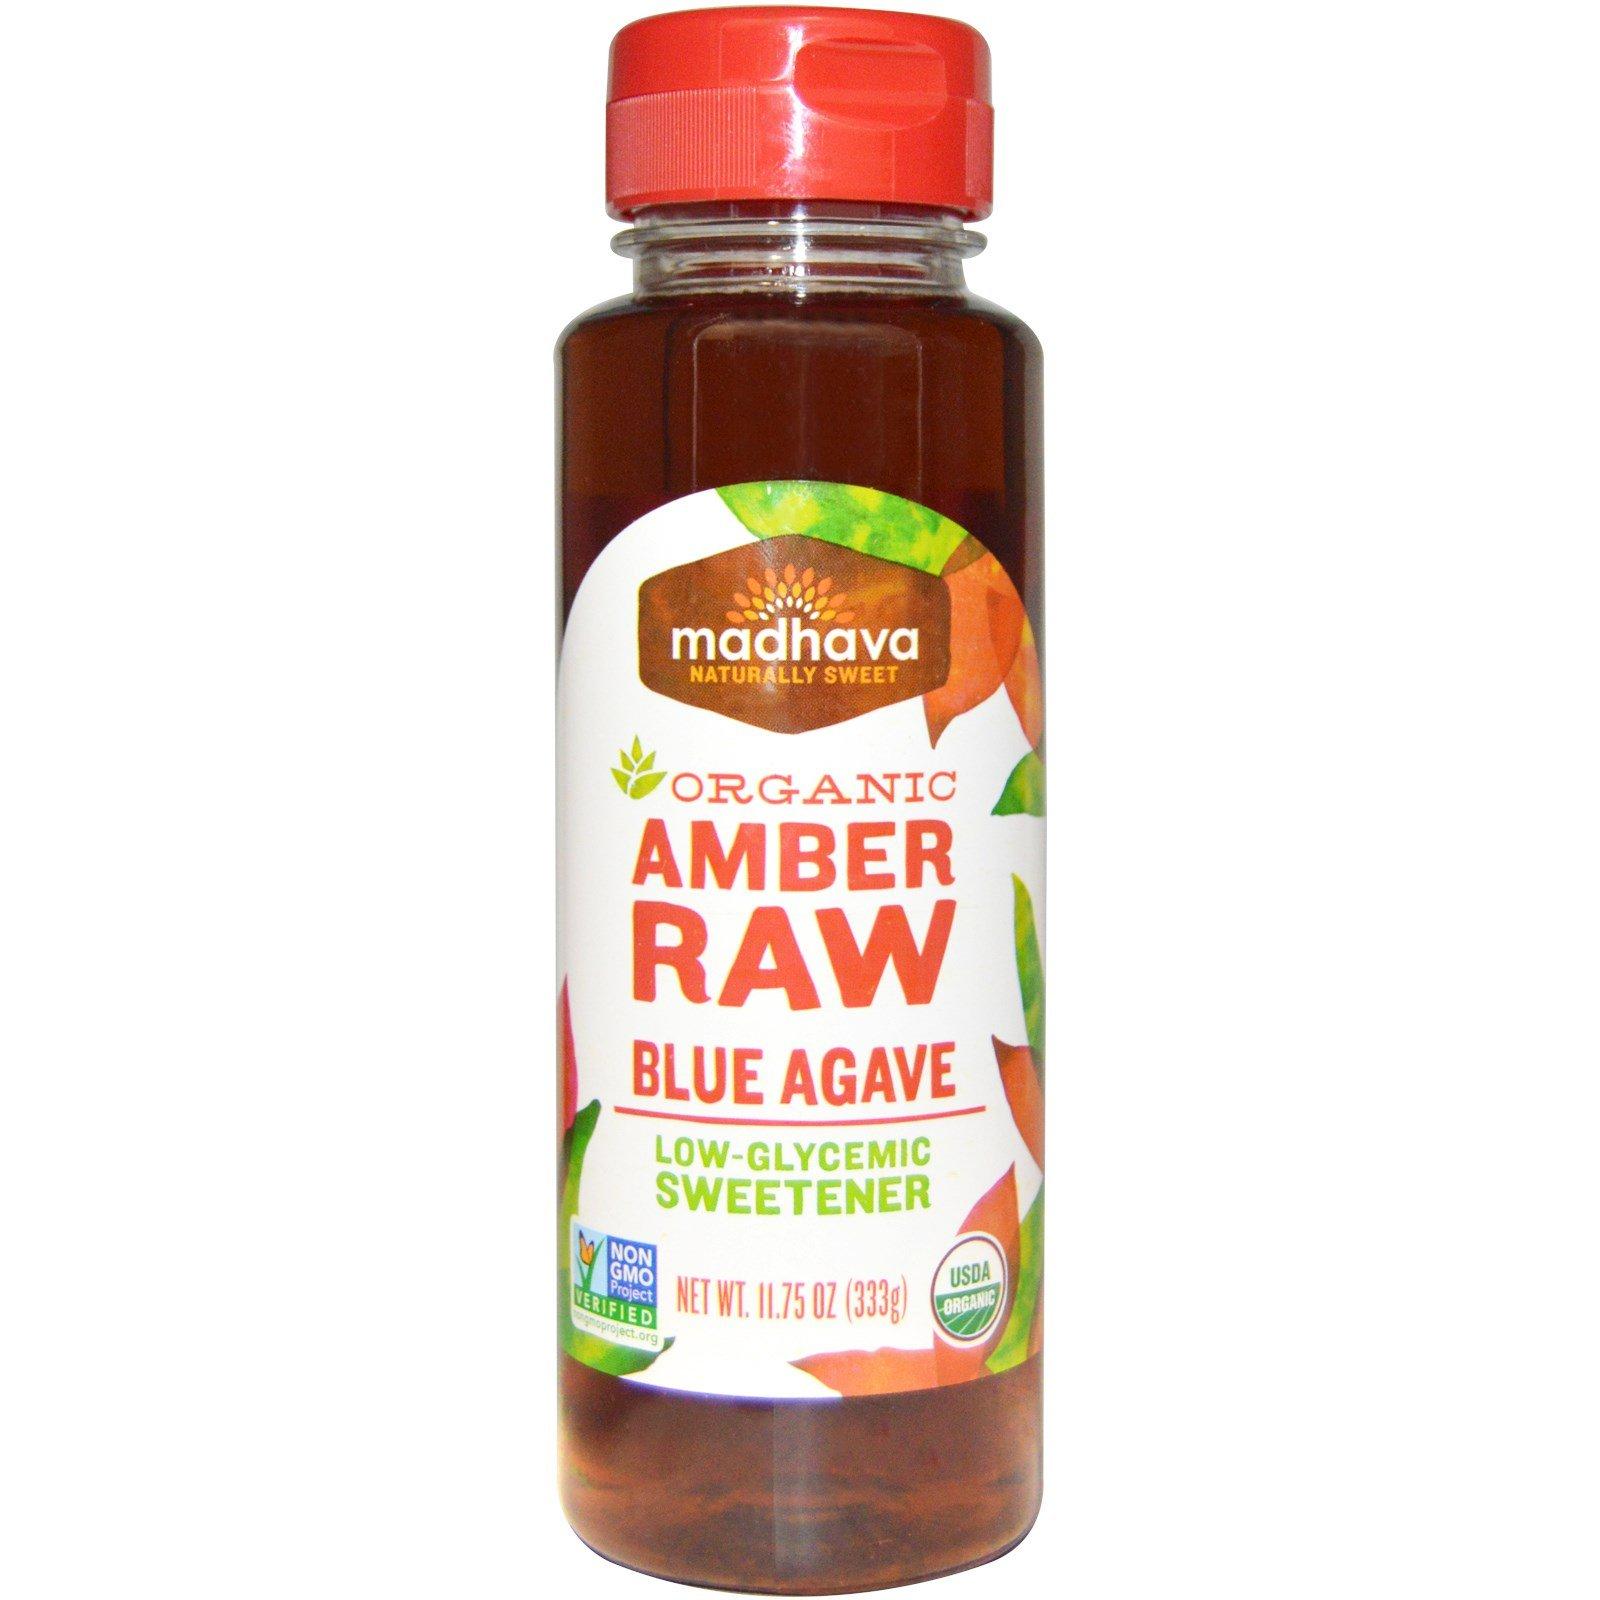 Madhava Natural Sweeteners, Organic Amber Agave Nectar, 11.75 oz (333 g) - 2pcs